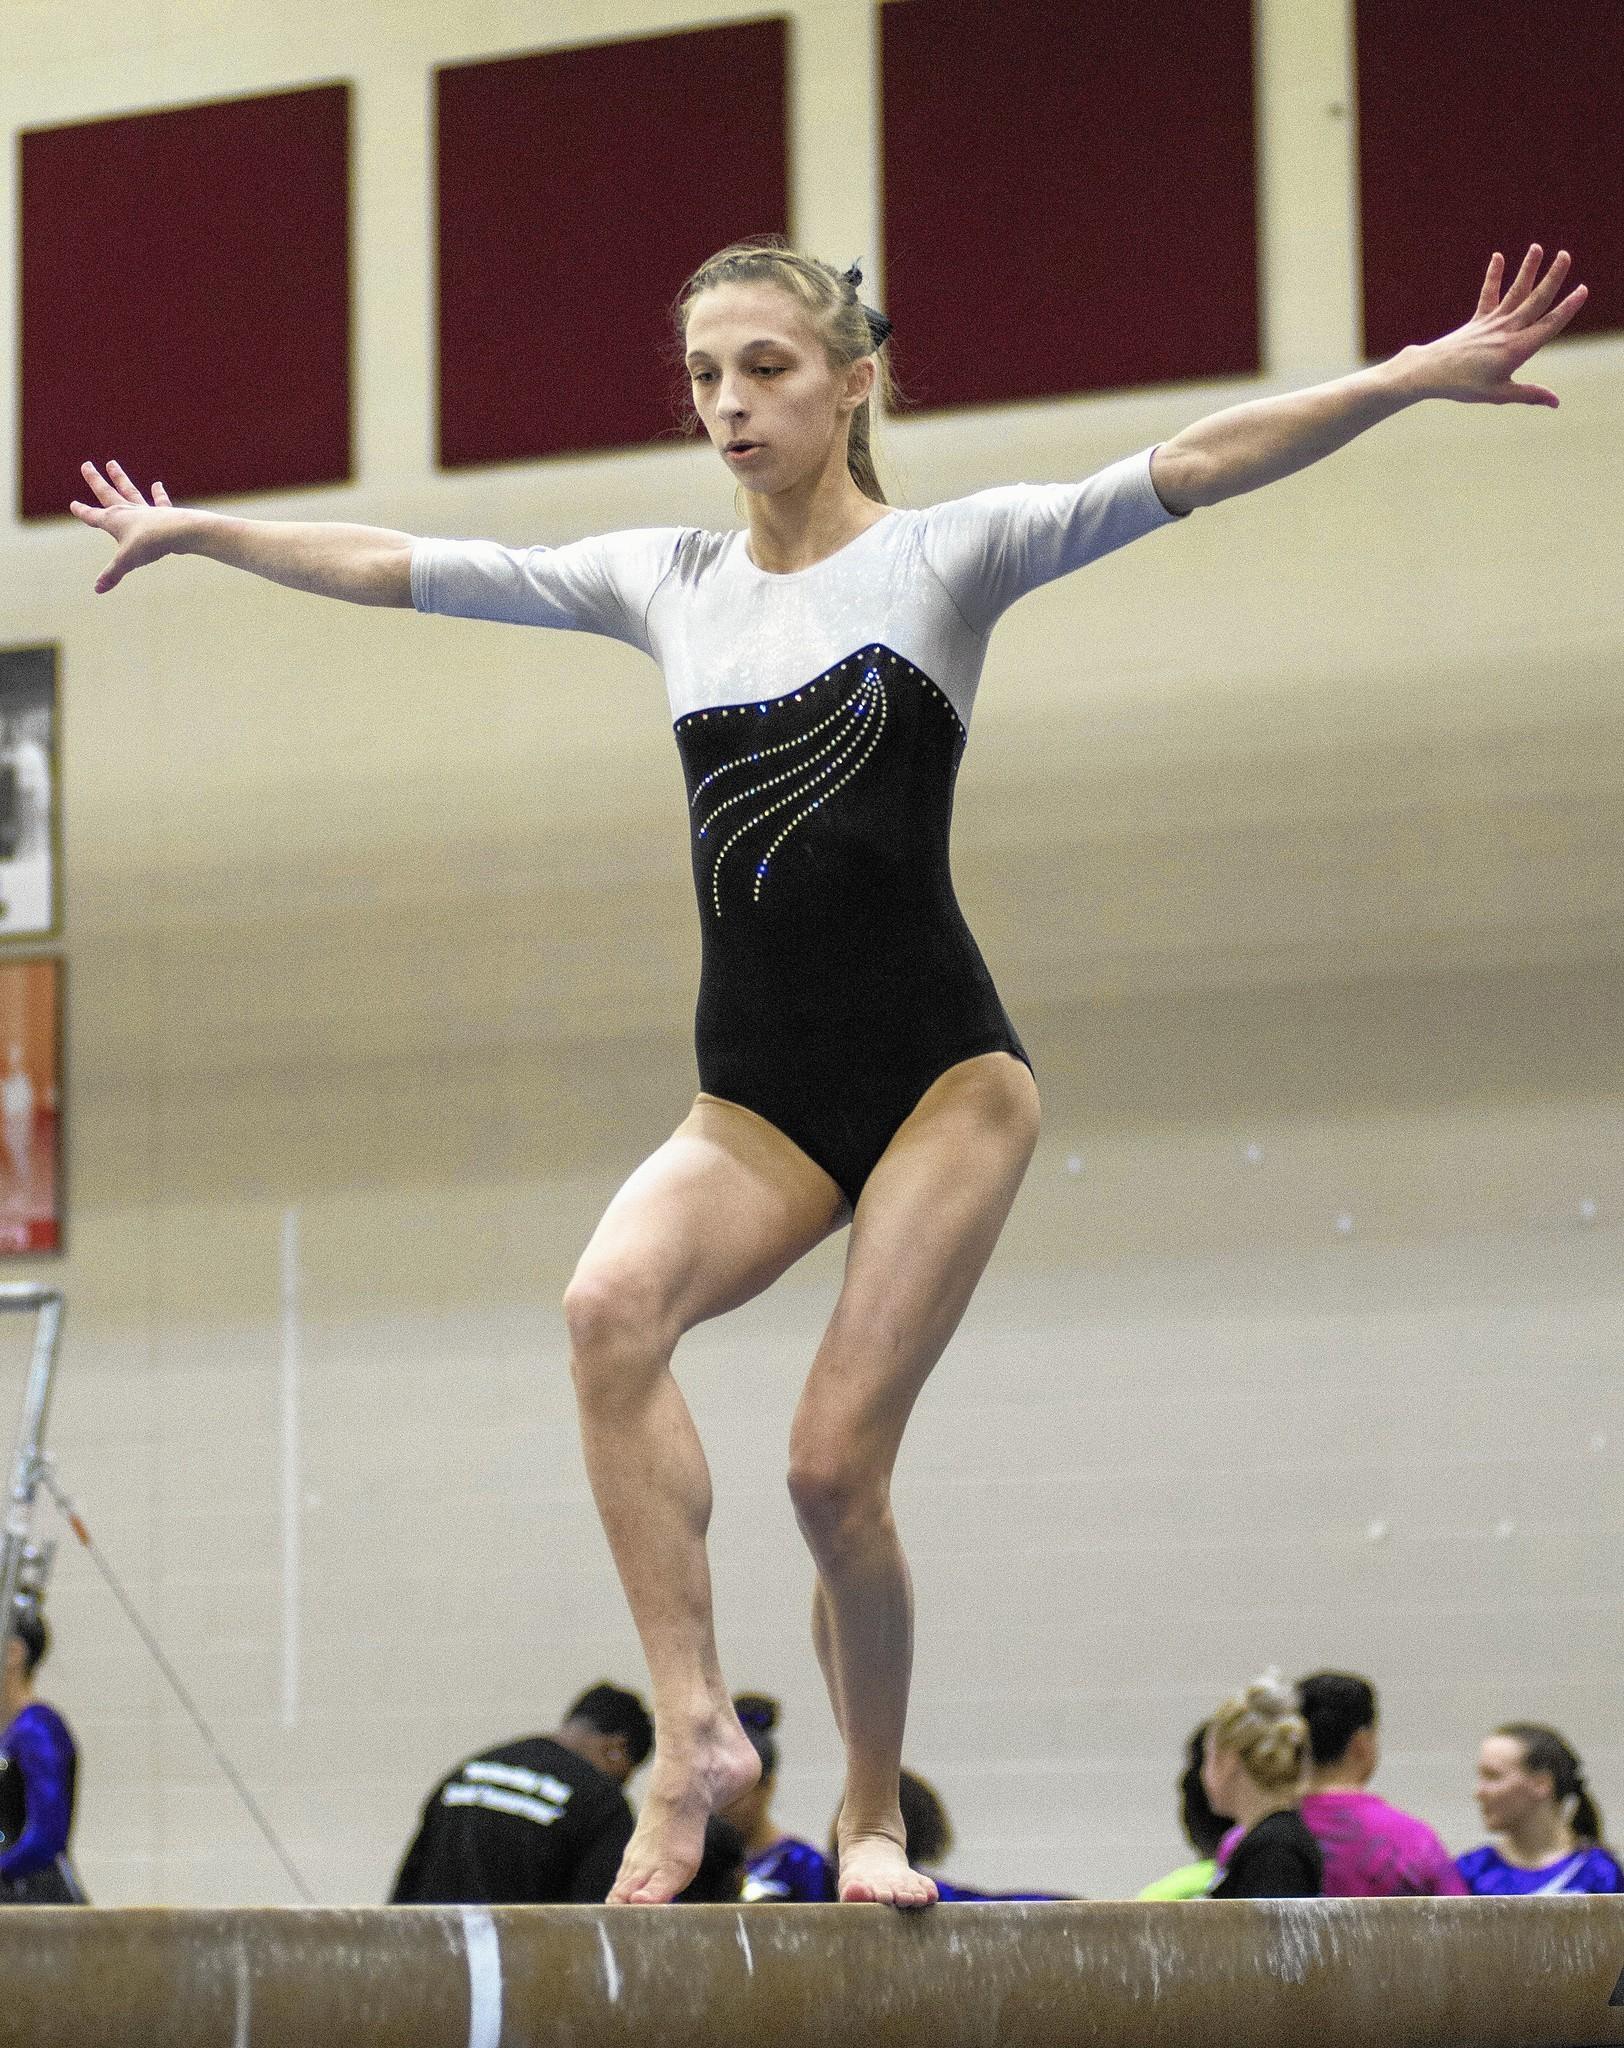 gymnastics spreading Girls gymnastics notes: LaPorte's Sarah Zygmuntowski raises the bar -  Post-Tribune